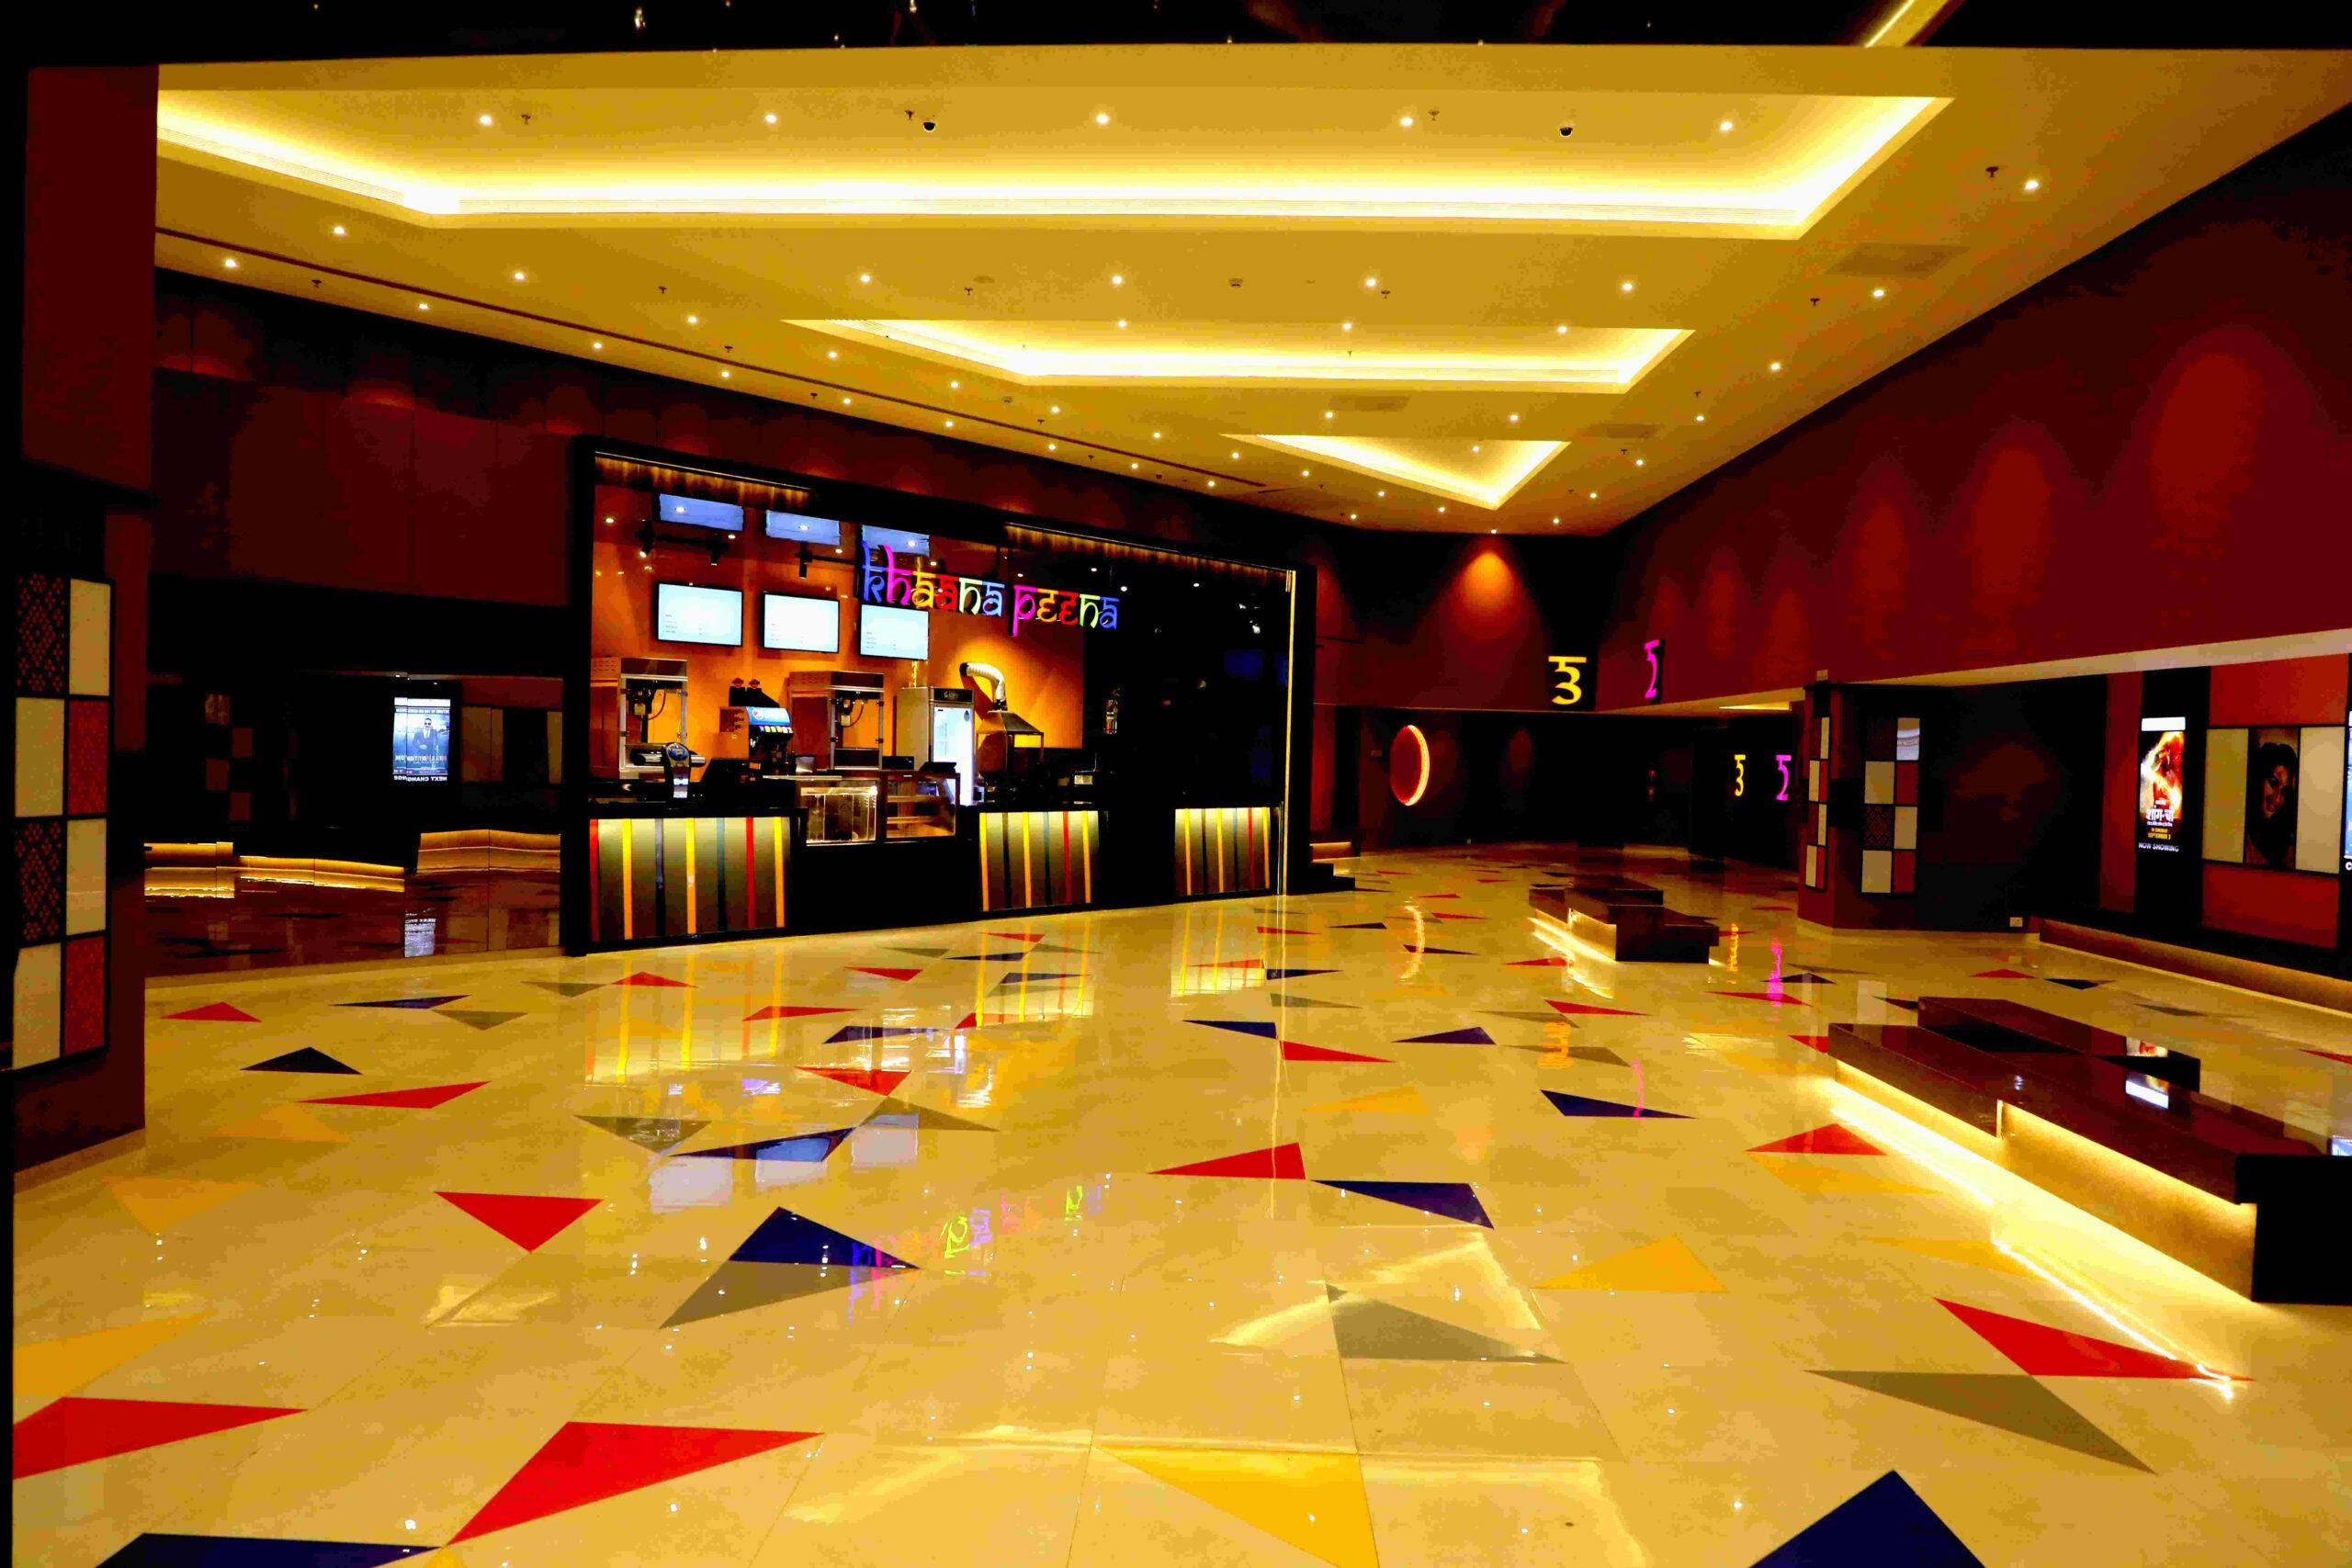 PVR Cinemas marks its debut in Jamnagar, 'World's Oil City'